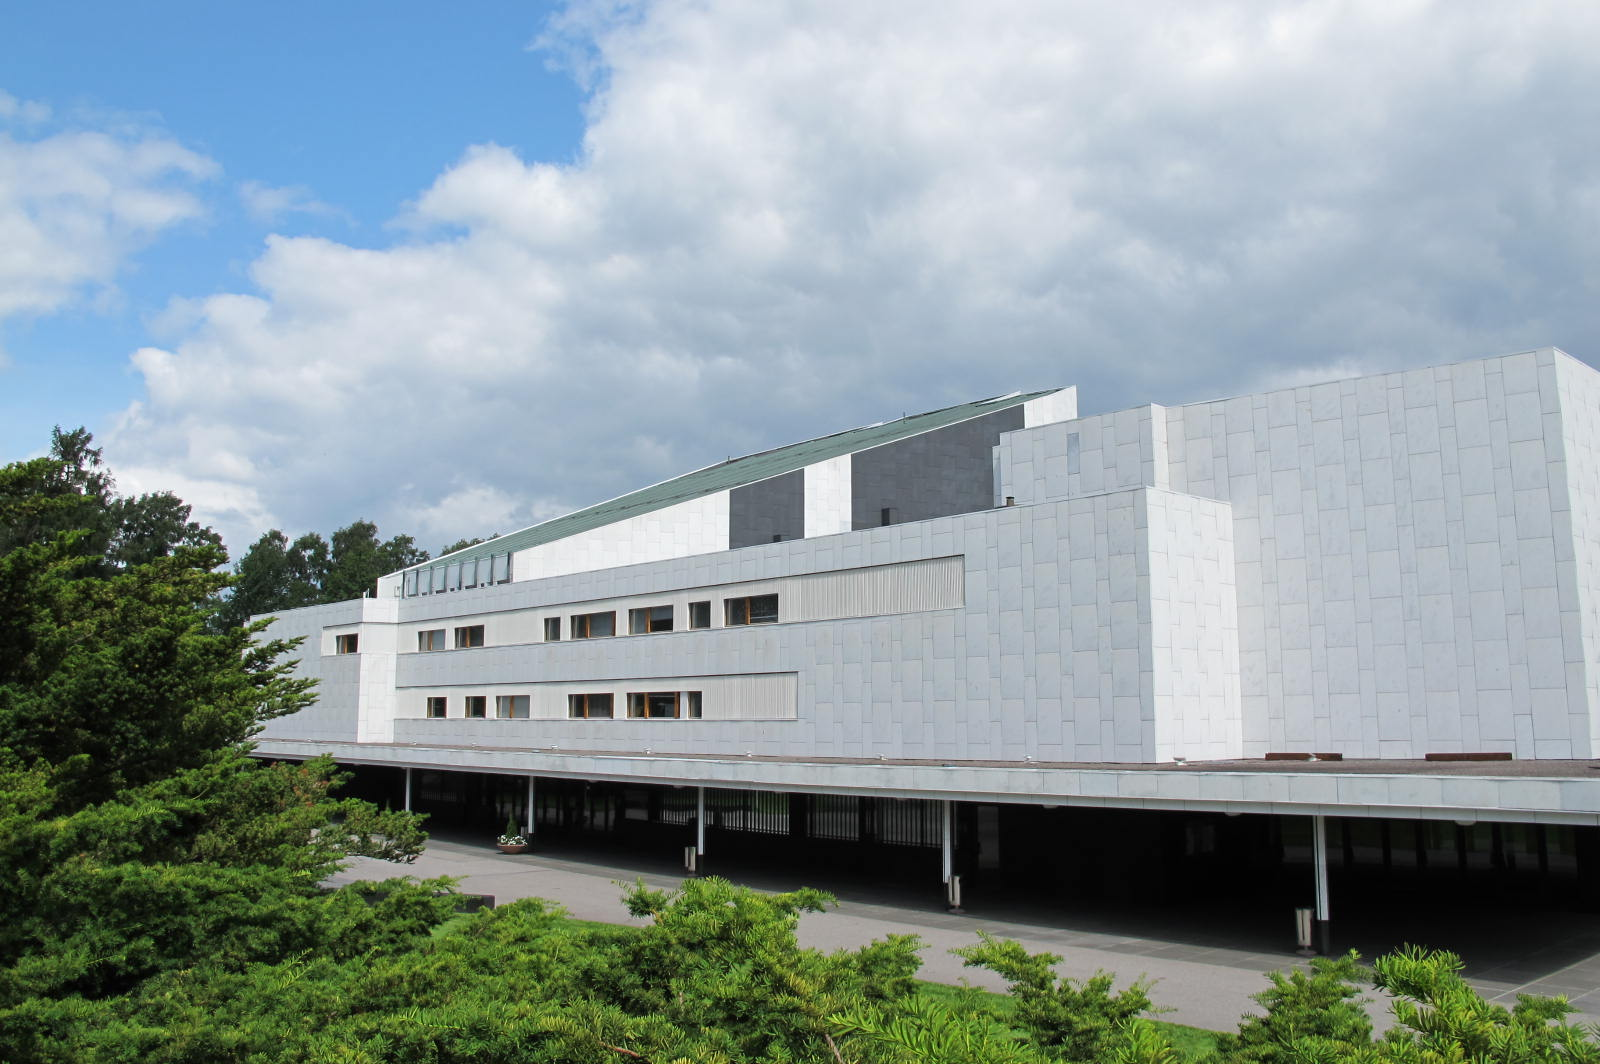 Finlandia Hall / 12 July 2015